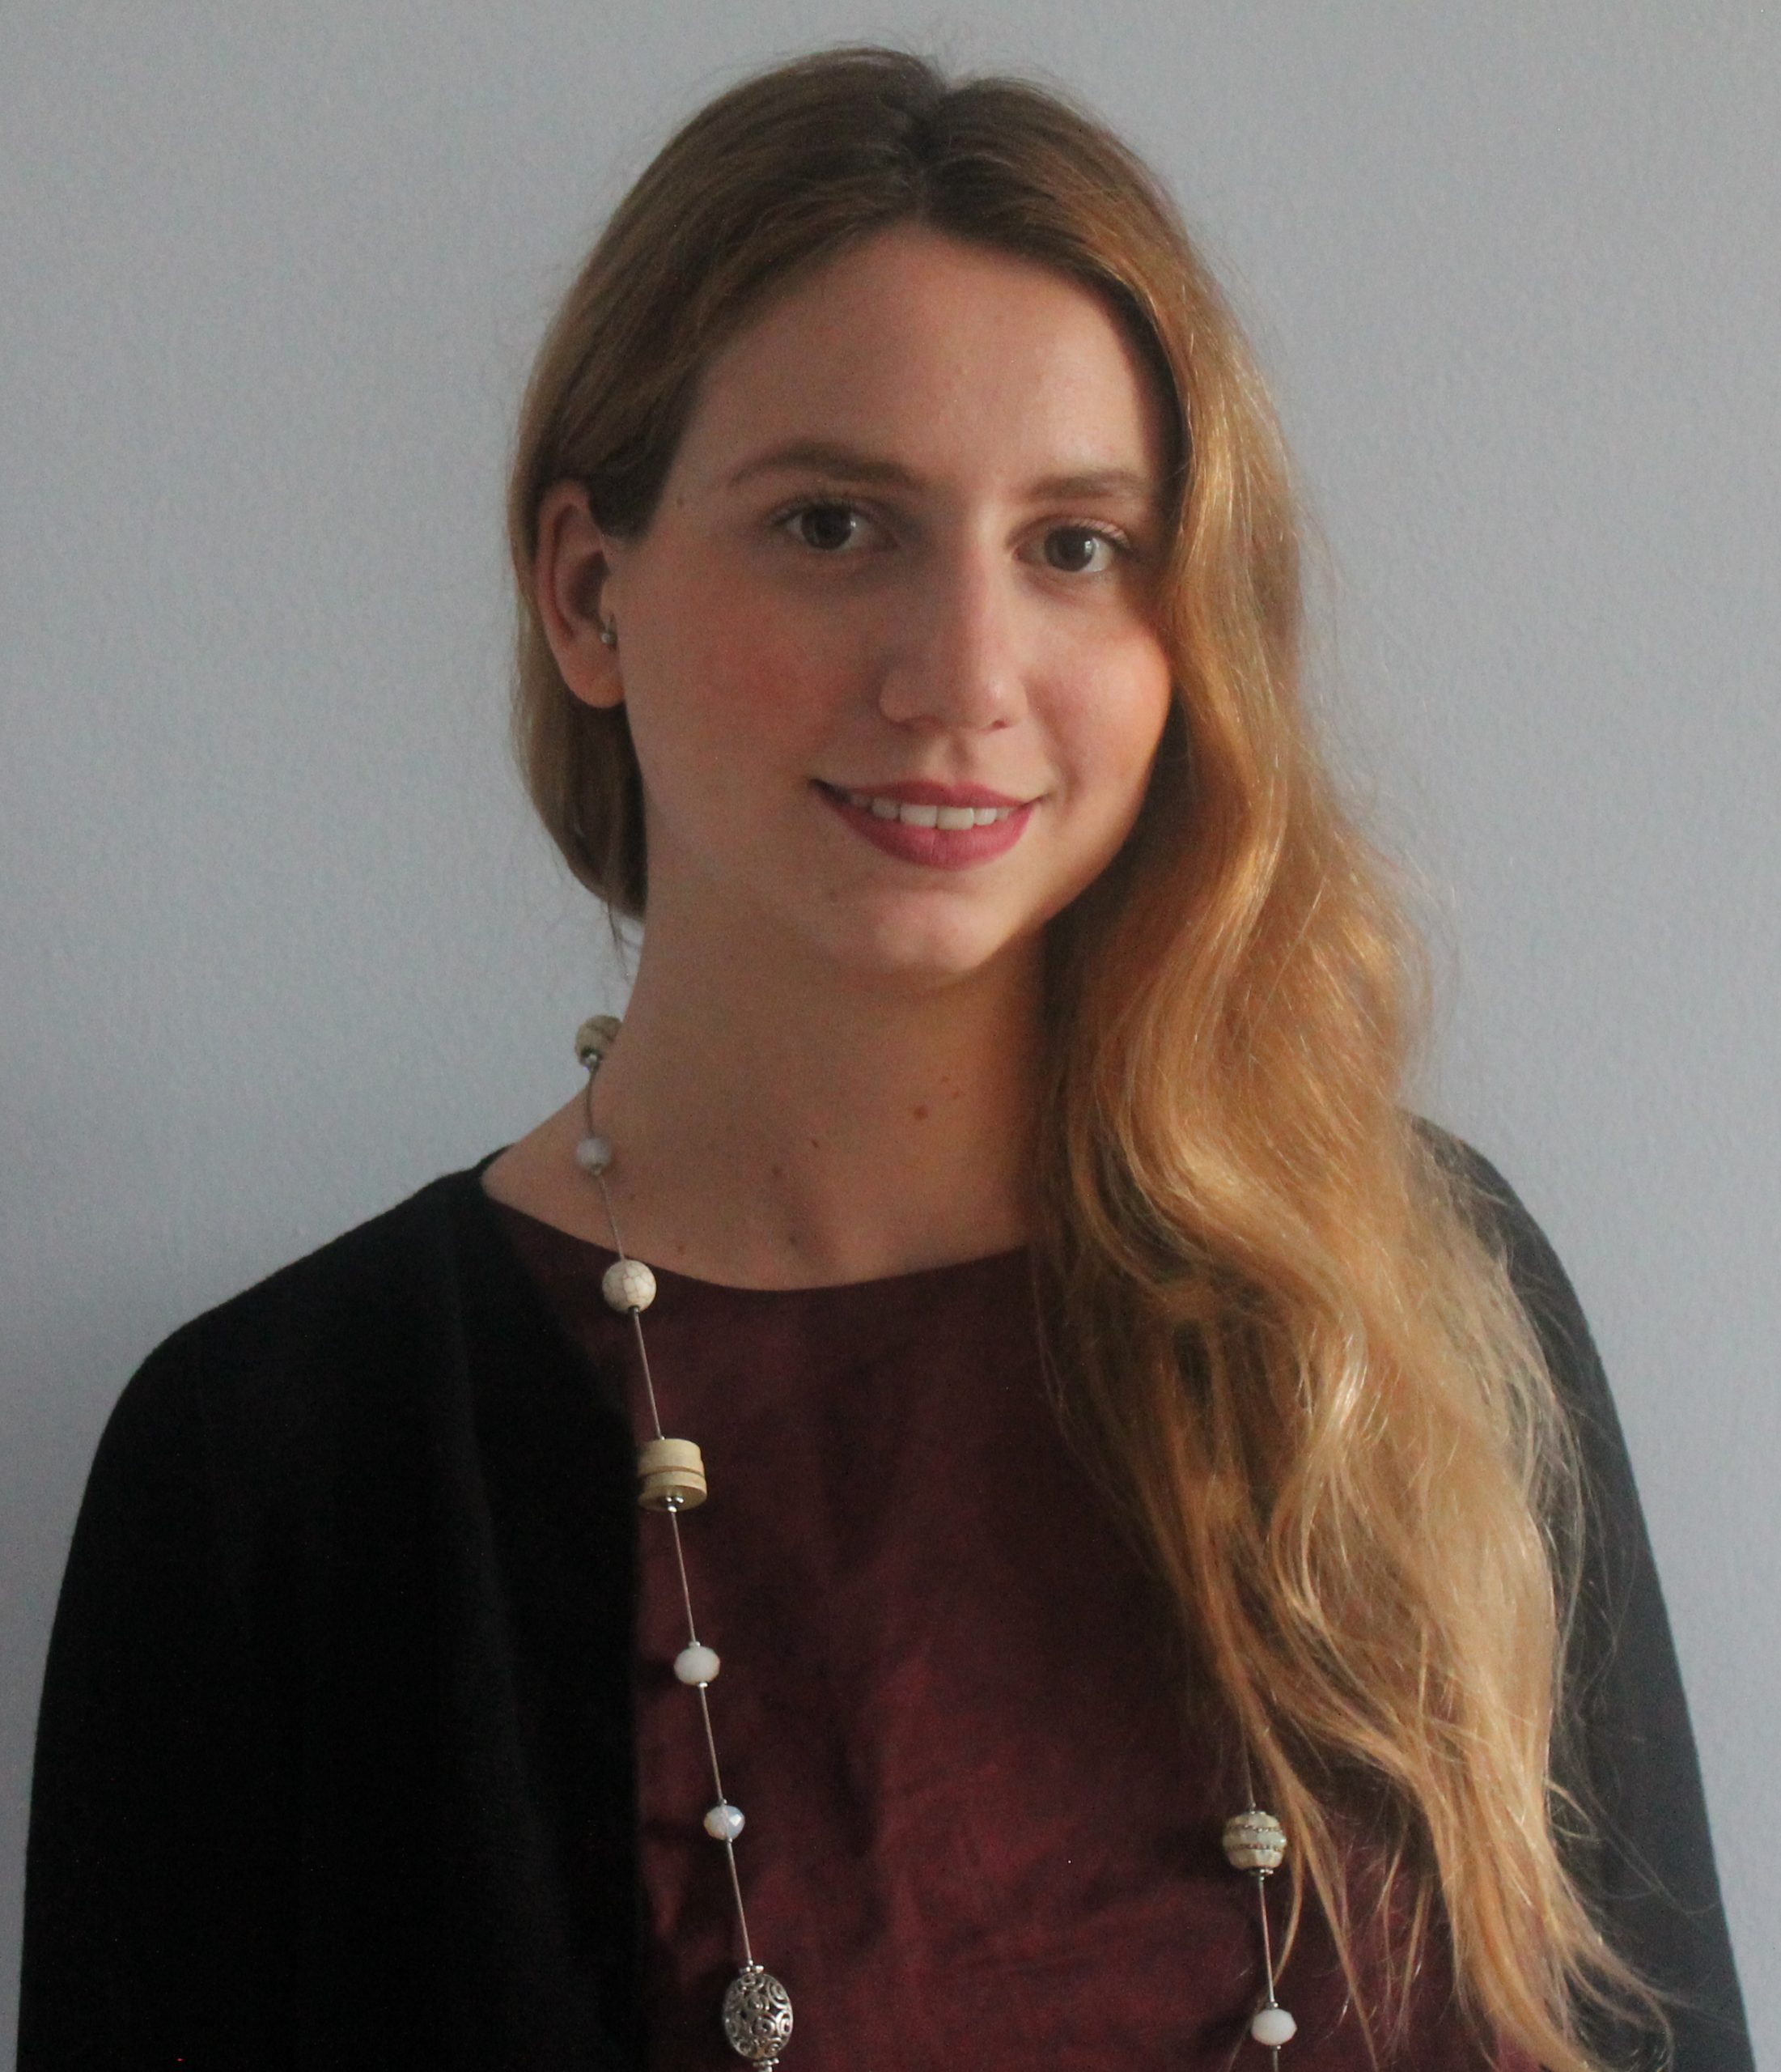 Bianca Campagnolo